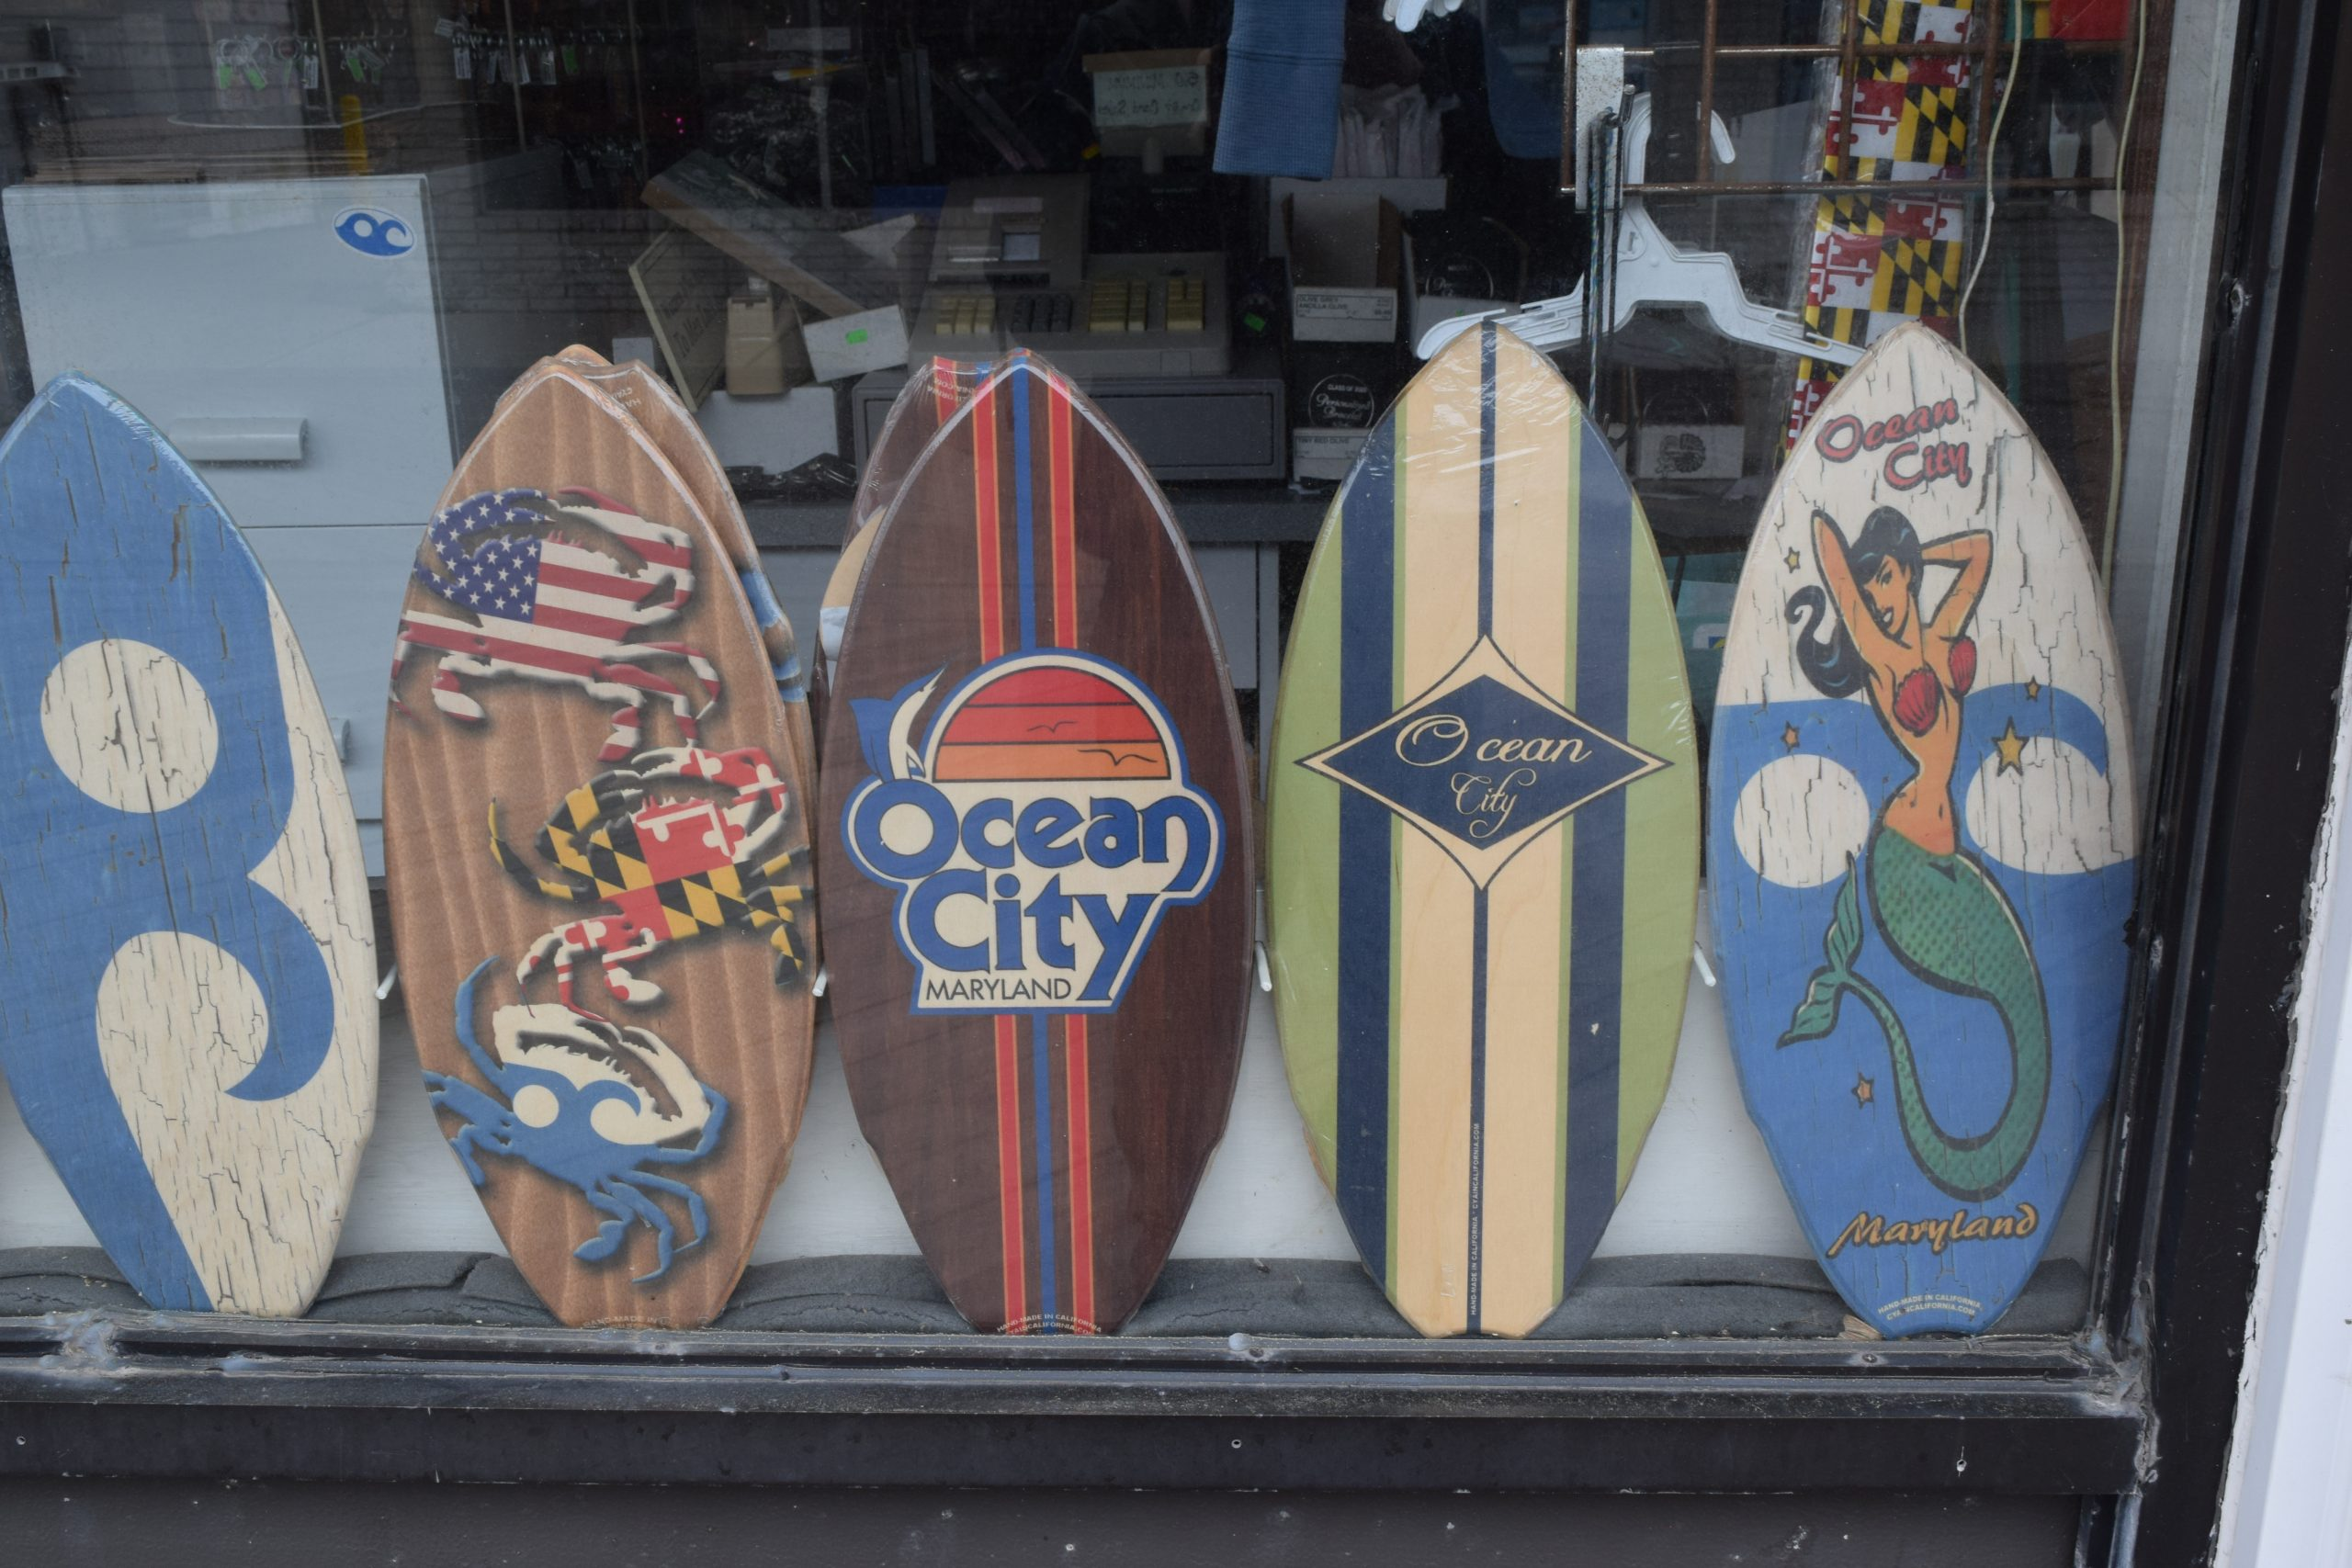 Ocean City shop